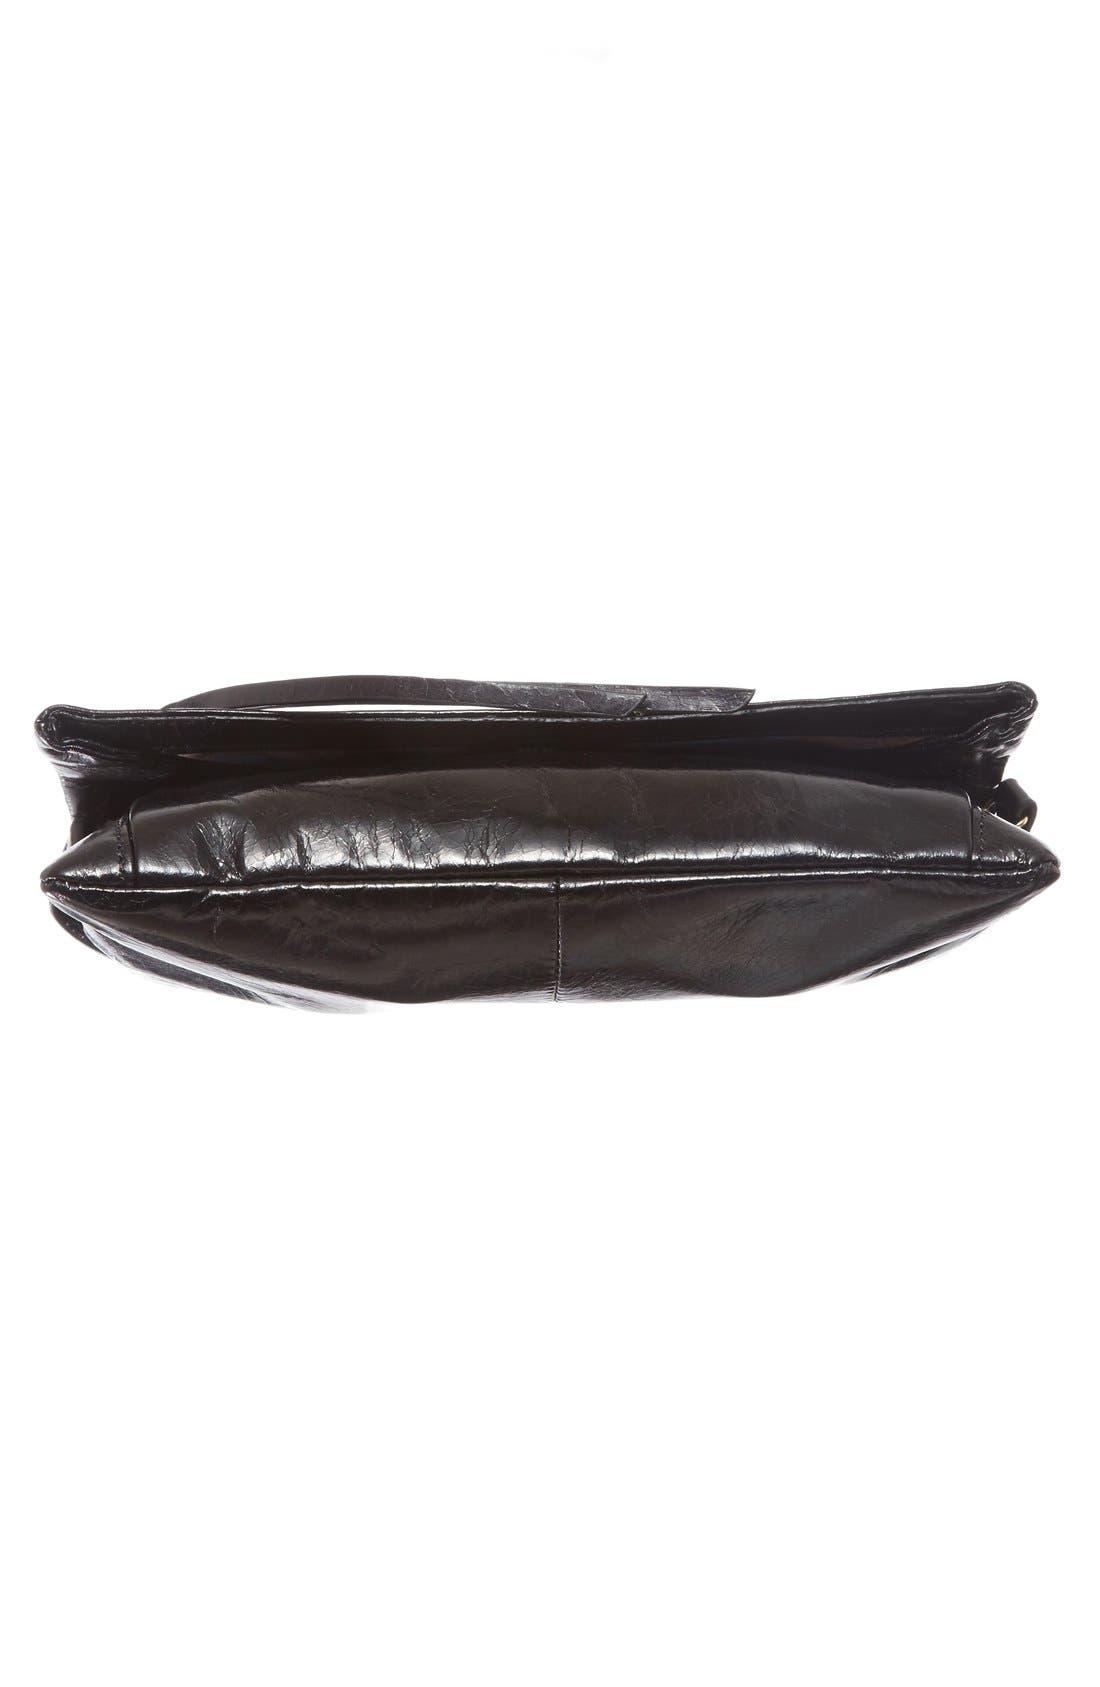 Rudy Leather Crossbody Bag,                             Alternate thumbnail 11, color,                             001